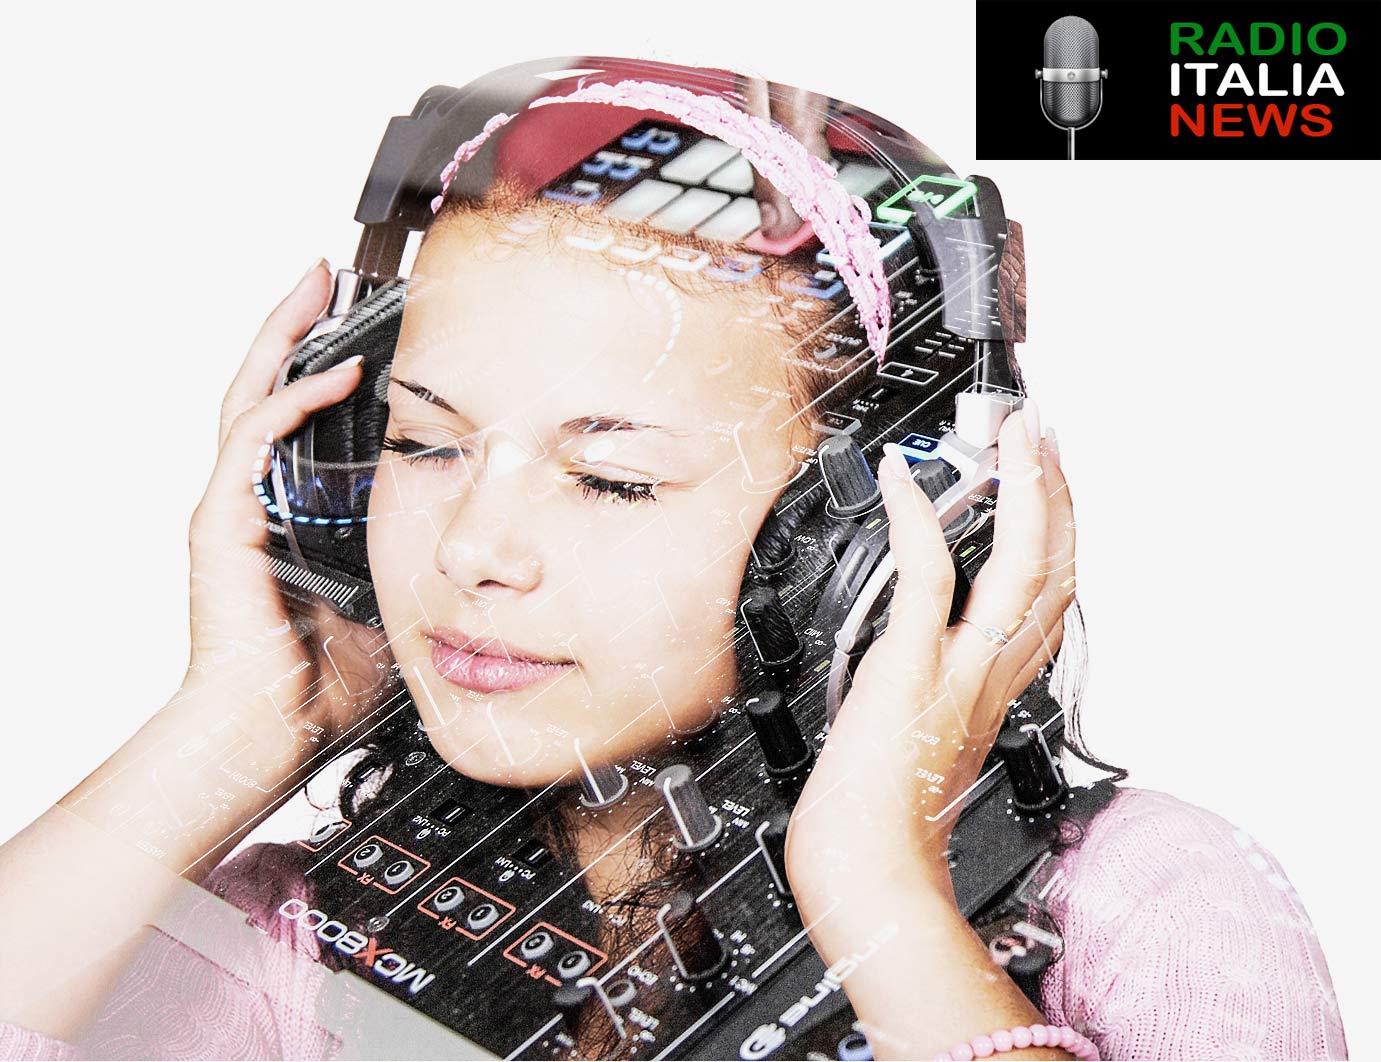 Radio Italia News Under Construction